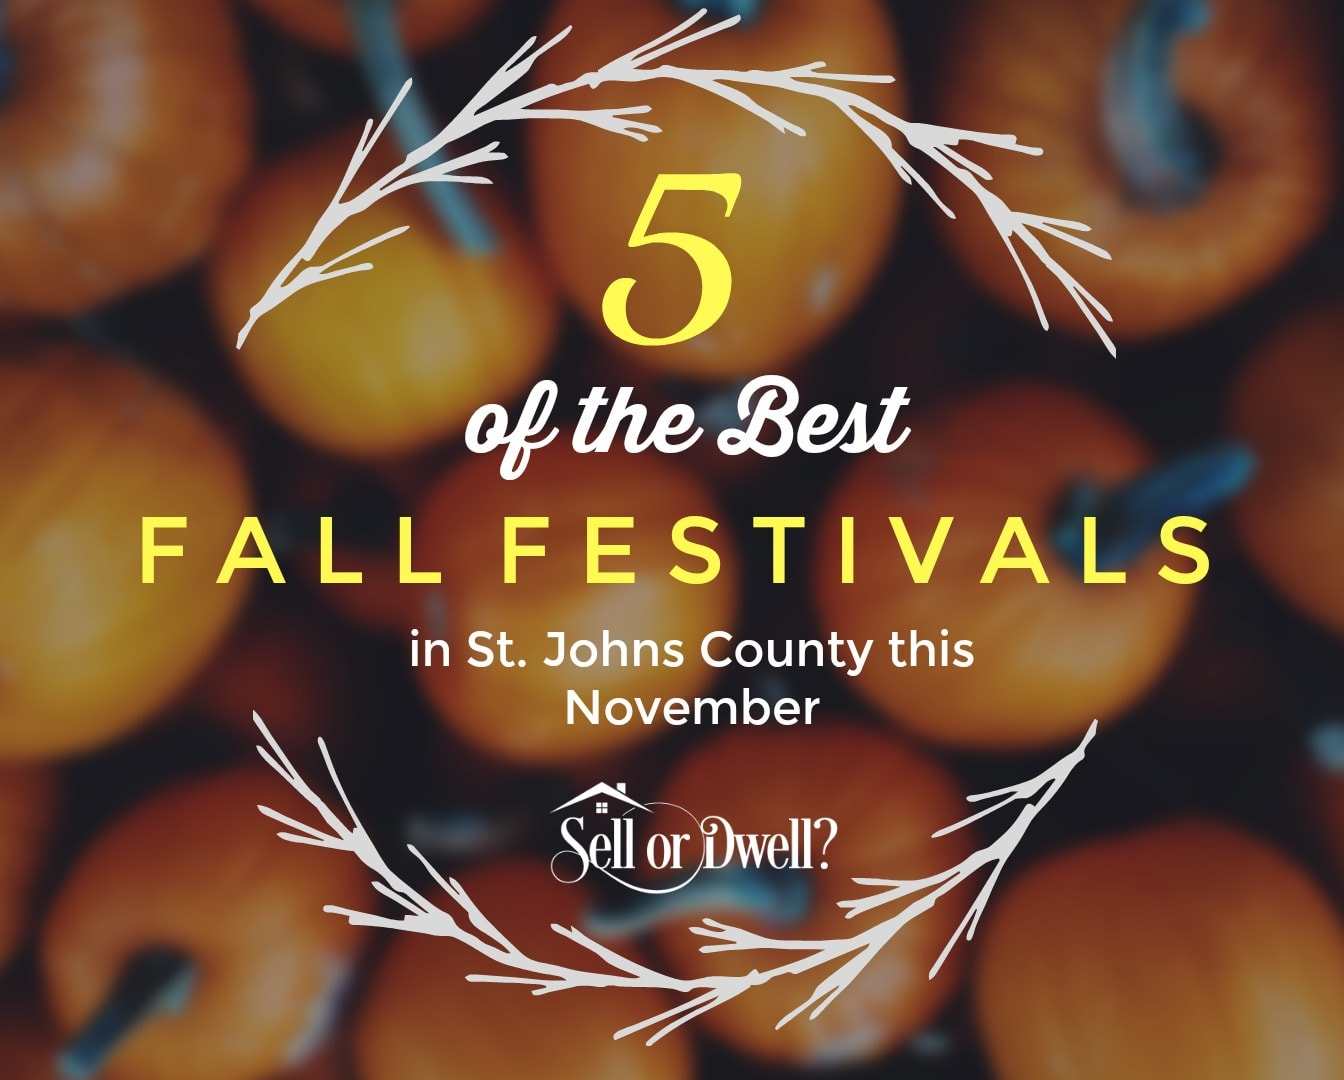 Best-Fall-Festival-in-St.-Johns-County.jpg